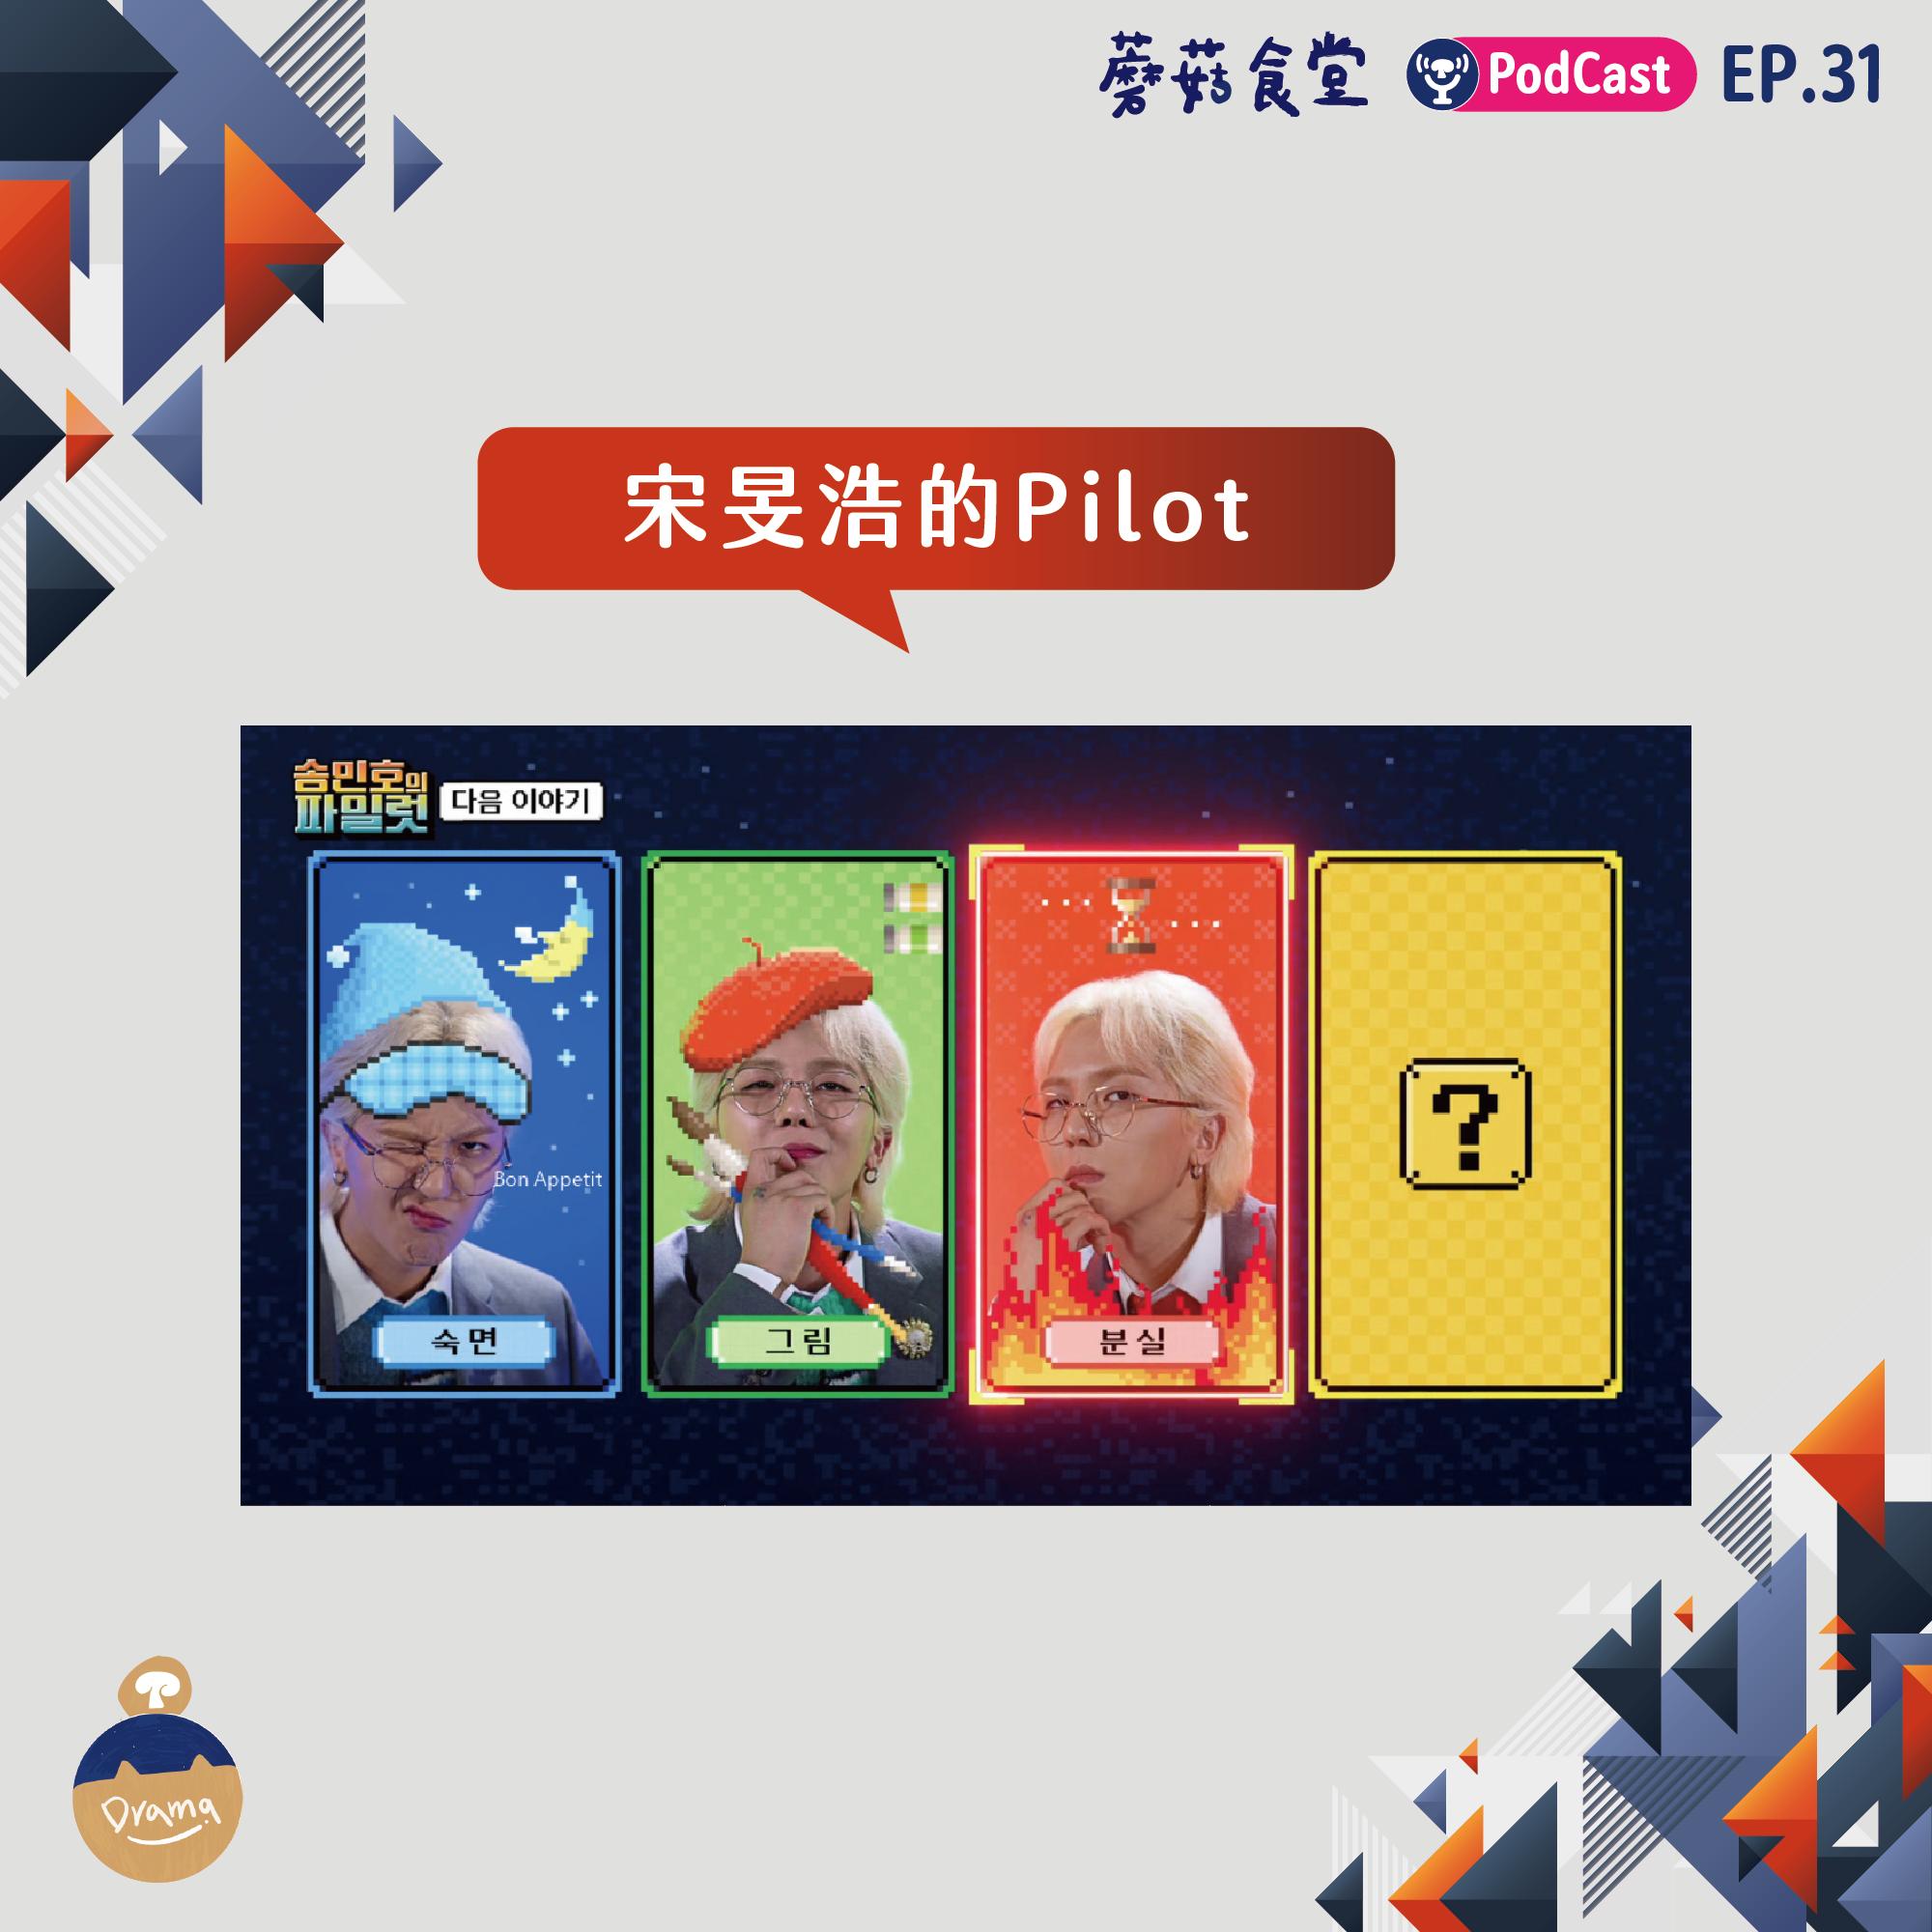 Ep31:宋旻浩的Pilot  最大型的迷你企劃